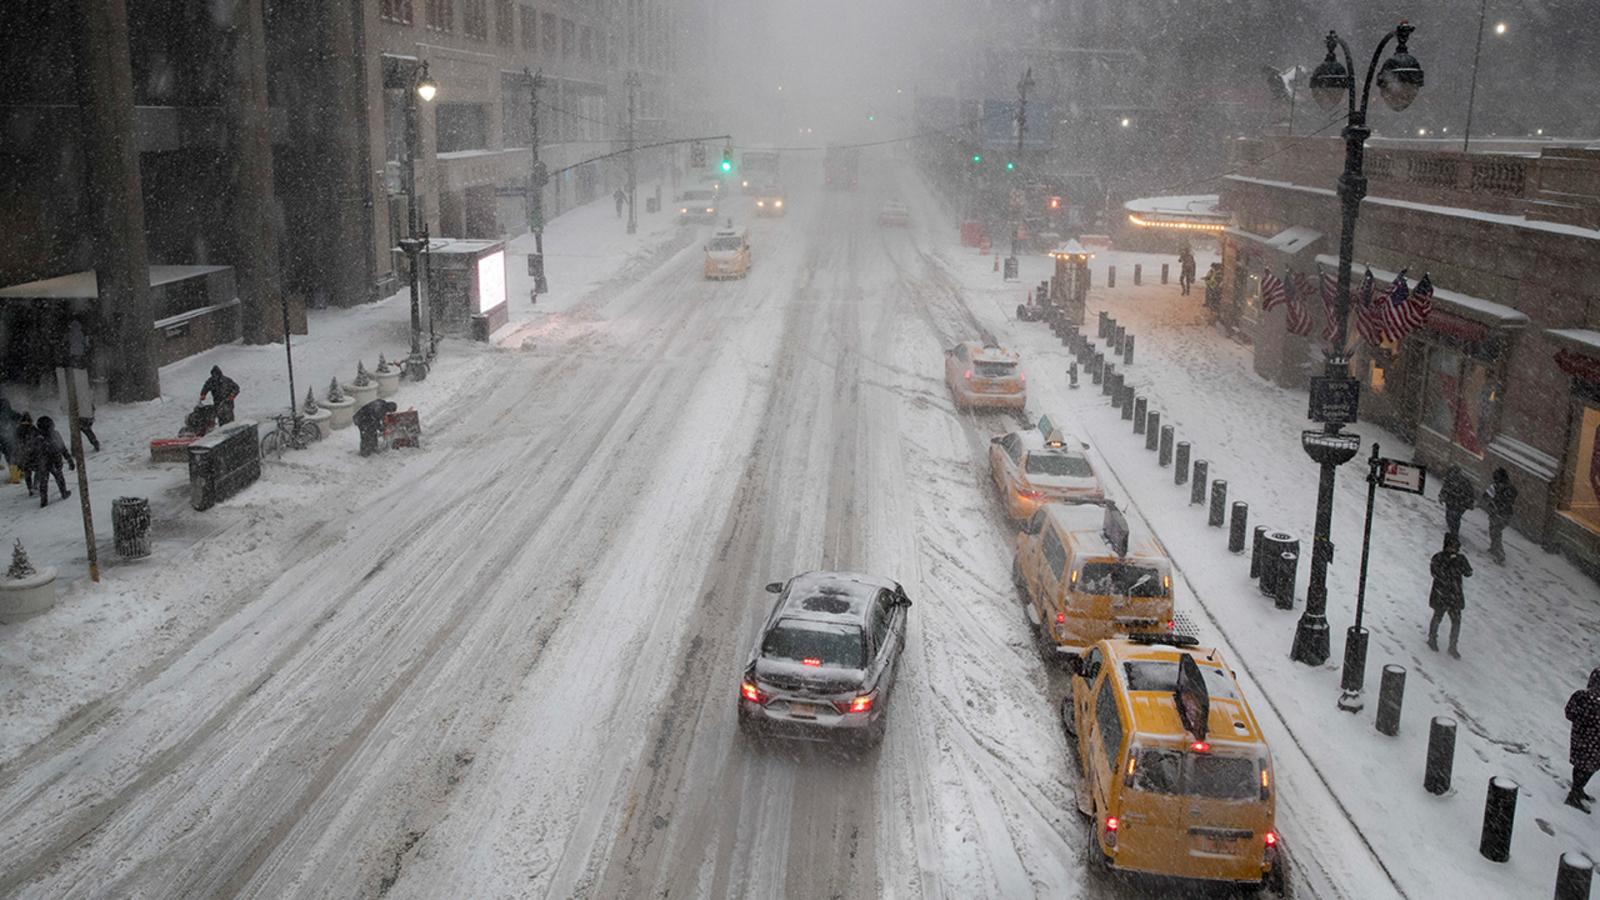 Nj Transit Lirr Metro North Mta Travel Information For New York Area Snowstorm Abc7 New York